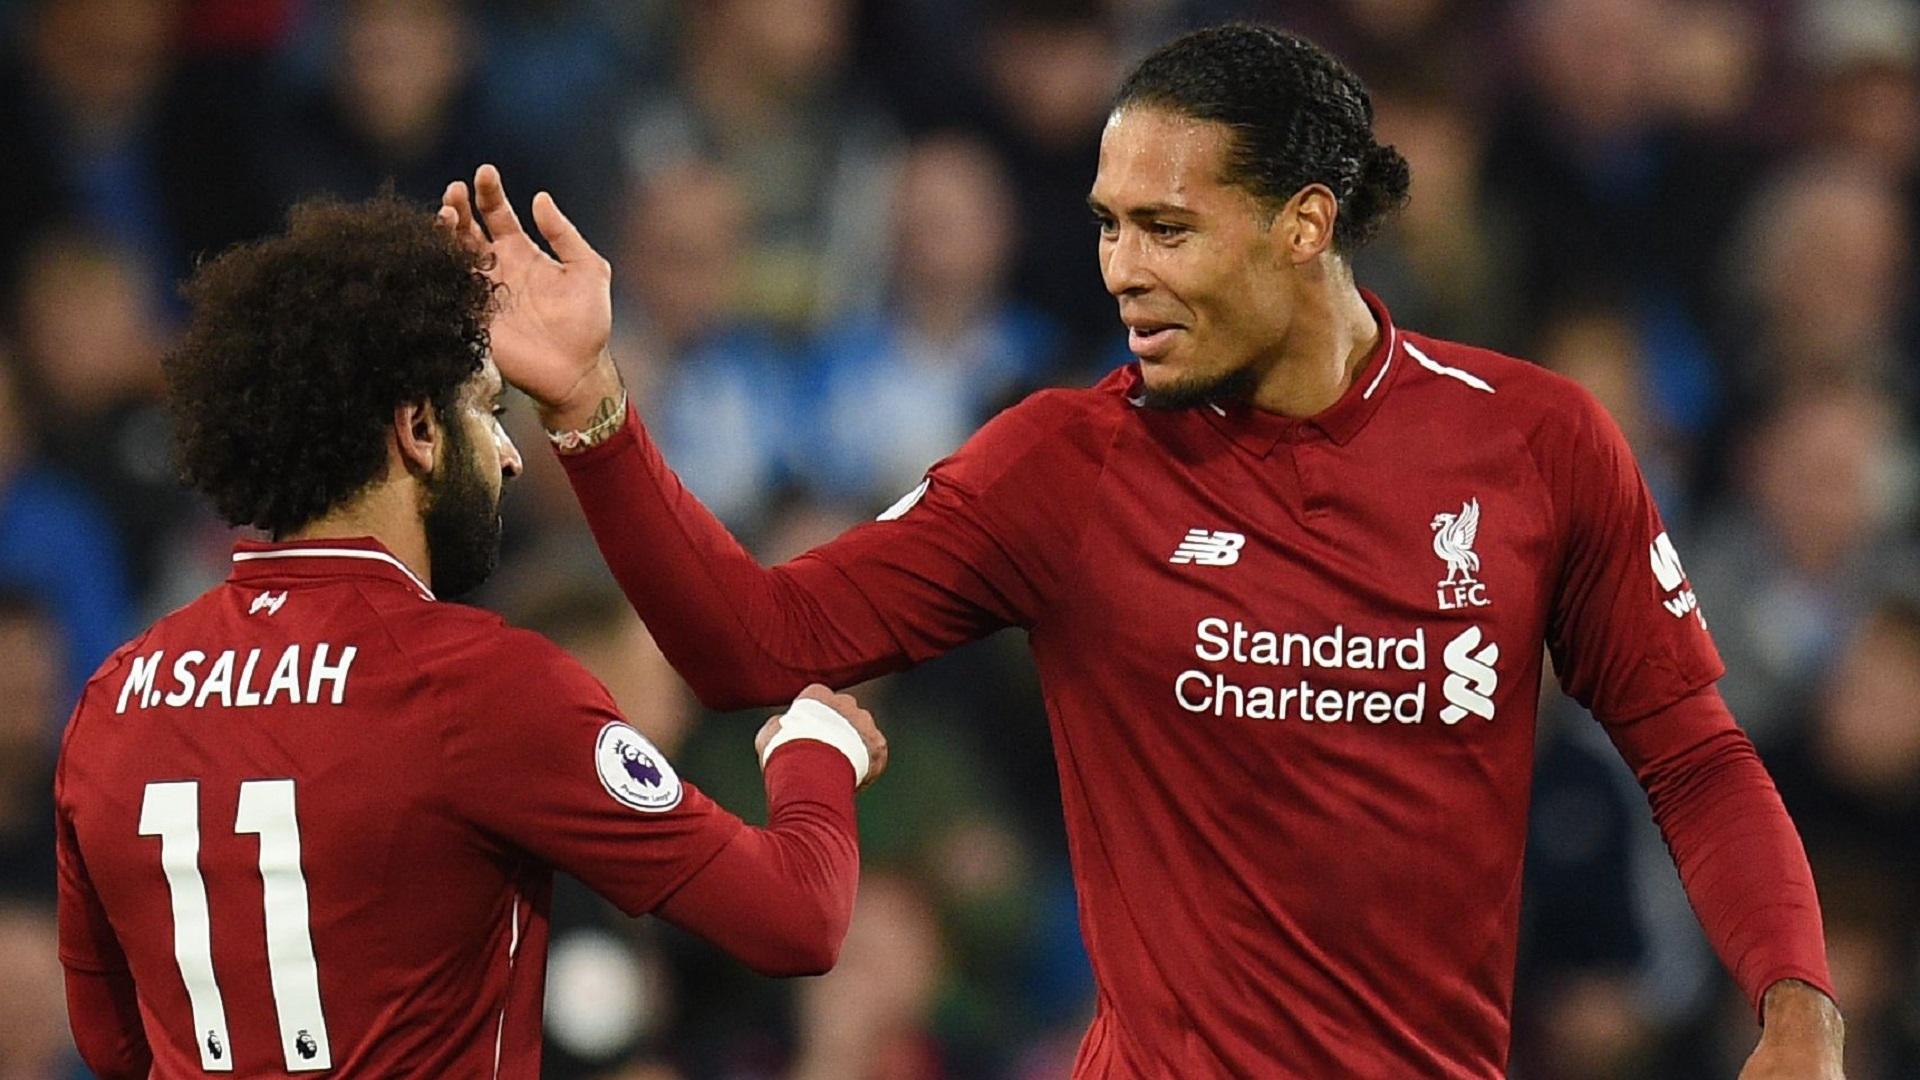 Mohamed Salah Virgil van Dijk Liverpool 24102018